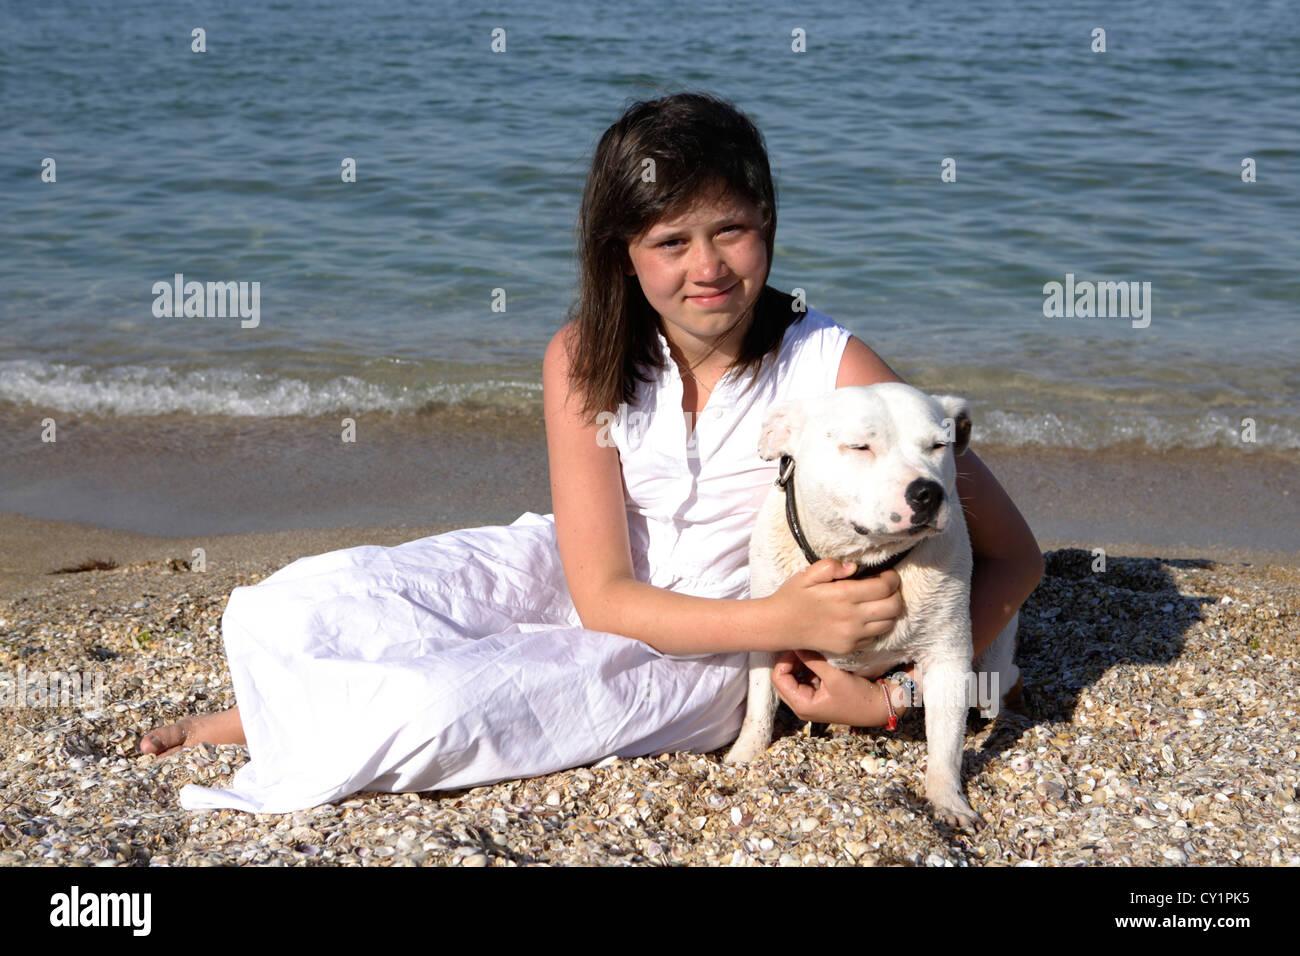 girl teenager dog sea holiday Staffordshire Bull Terrier - Stock Image